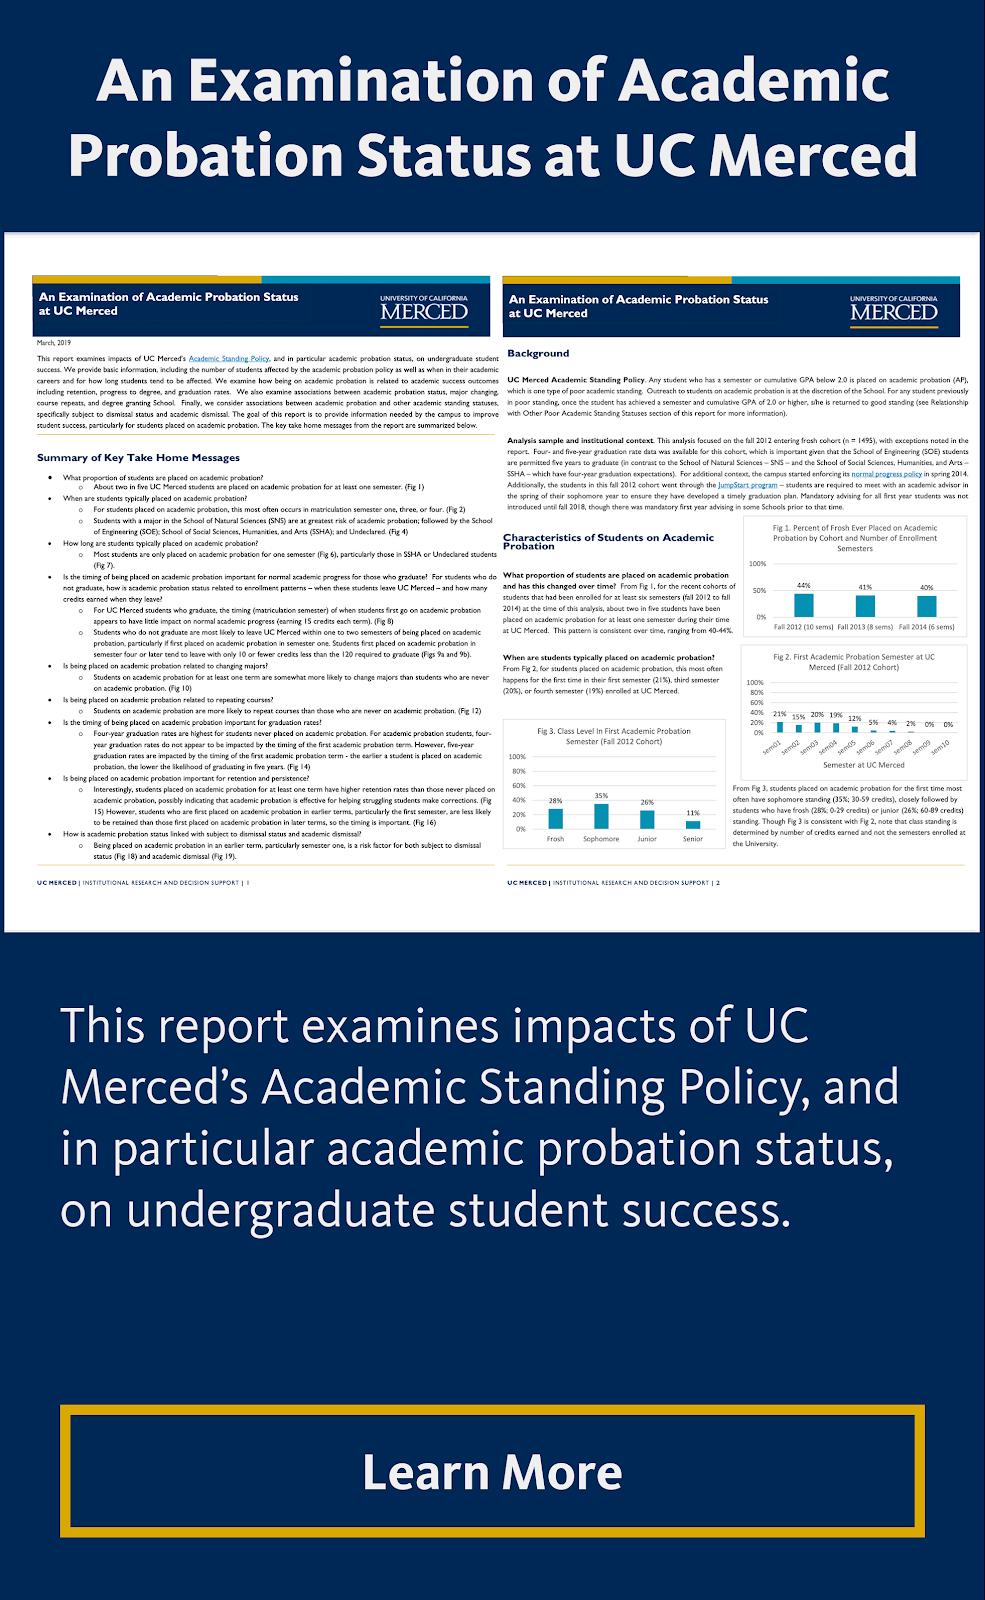 An Examination of Academic Probation Status at UC Merced